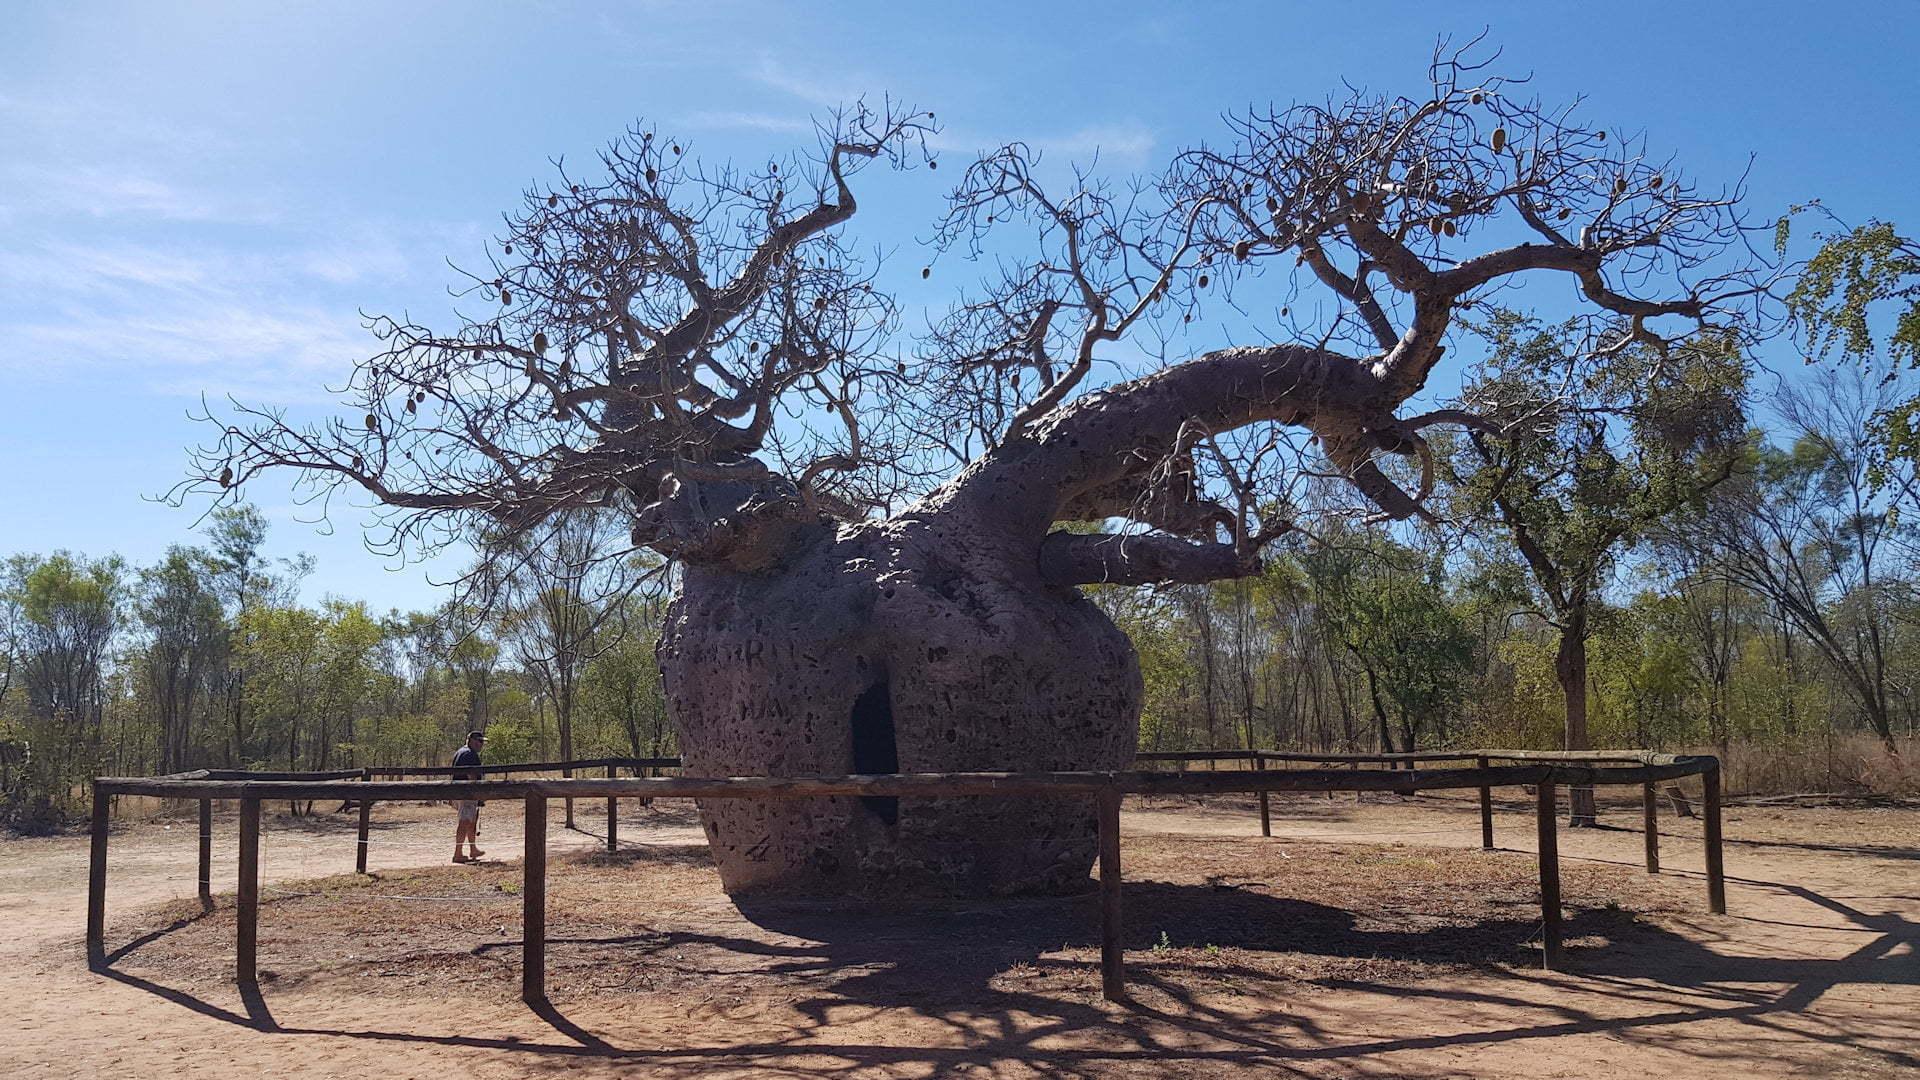 Prison BOAB Tree in Western Australia